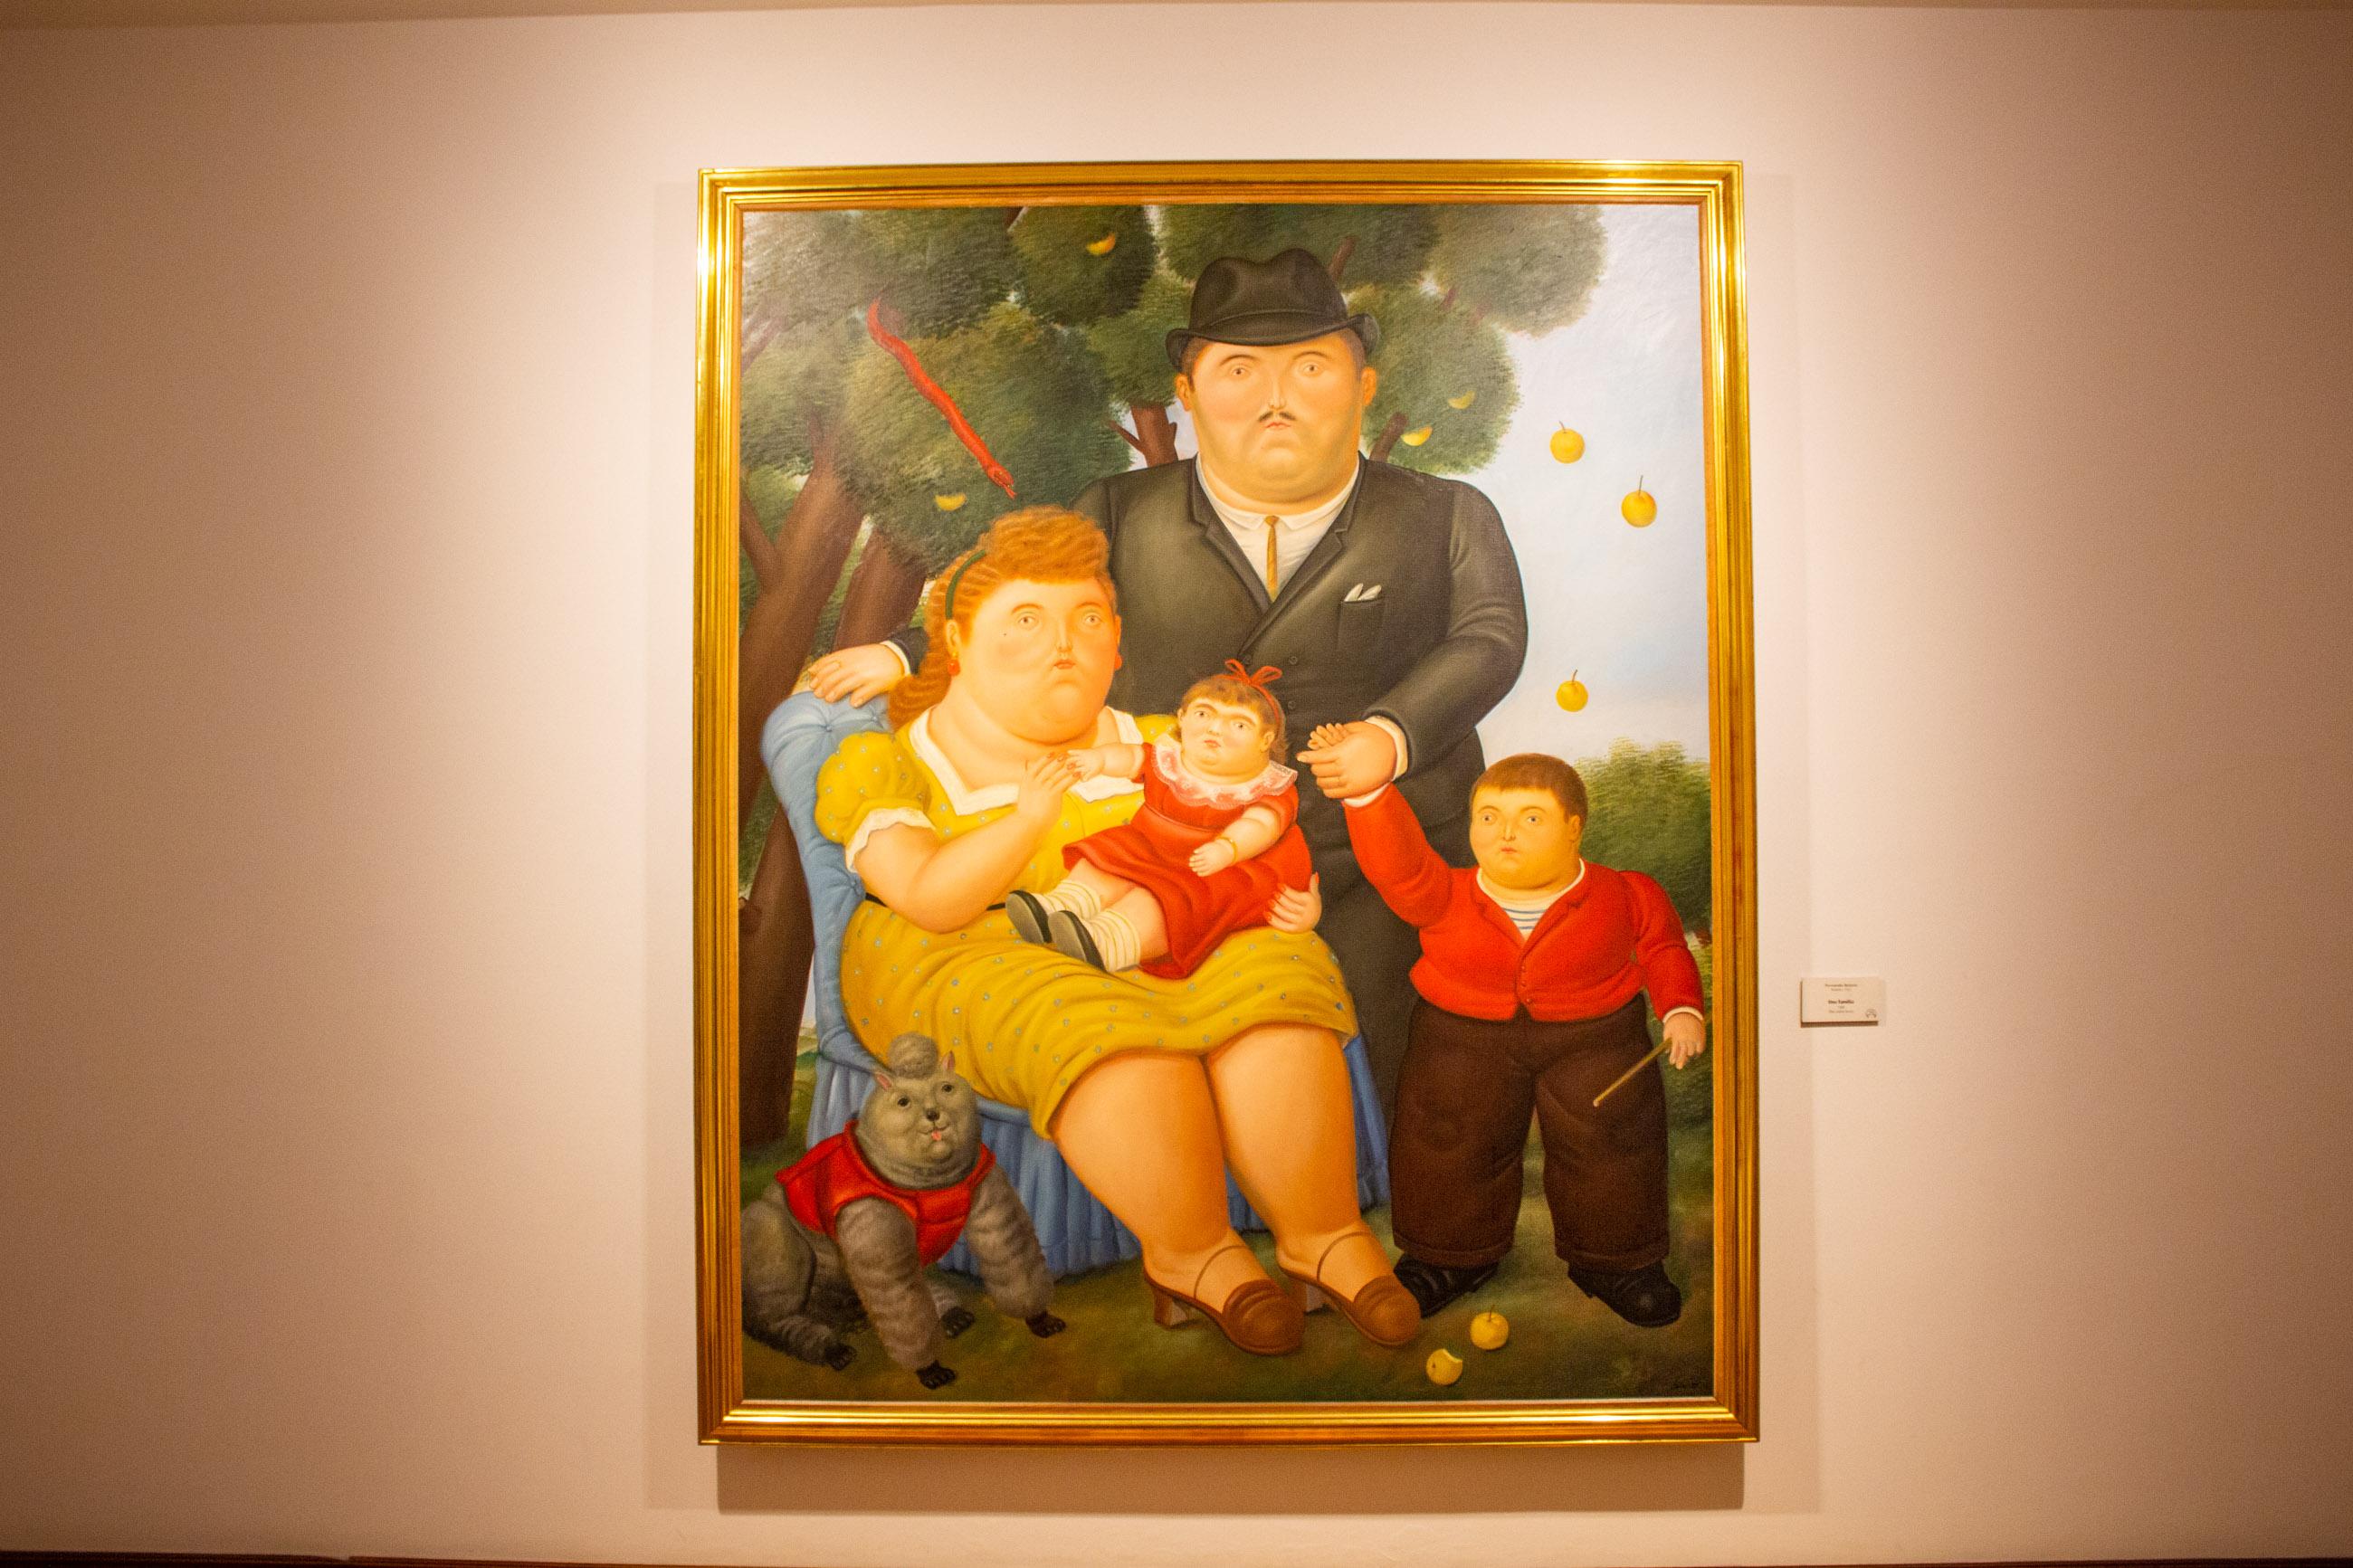 https://bubo.sk/uploads/galleries/7416/alenaspisakova_kolumbiabogotaboteromuzeum3.jpg